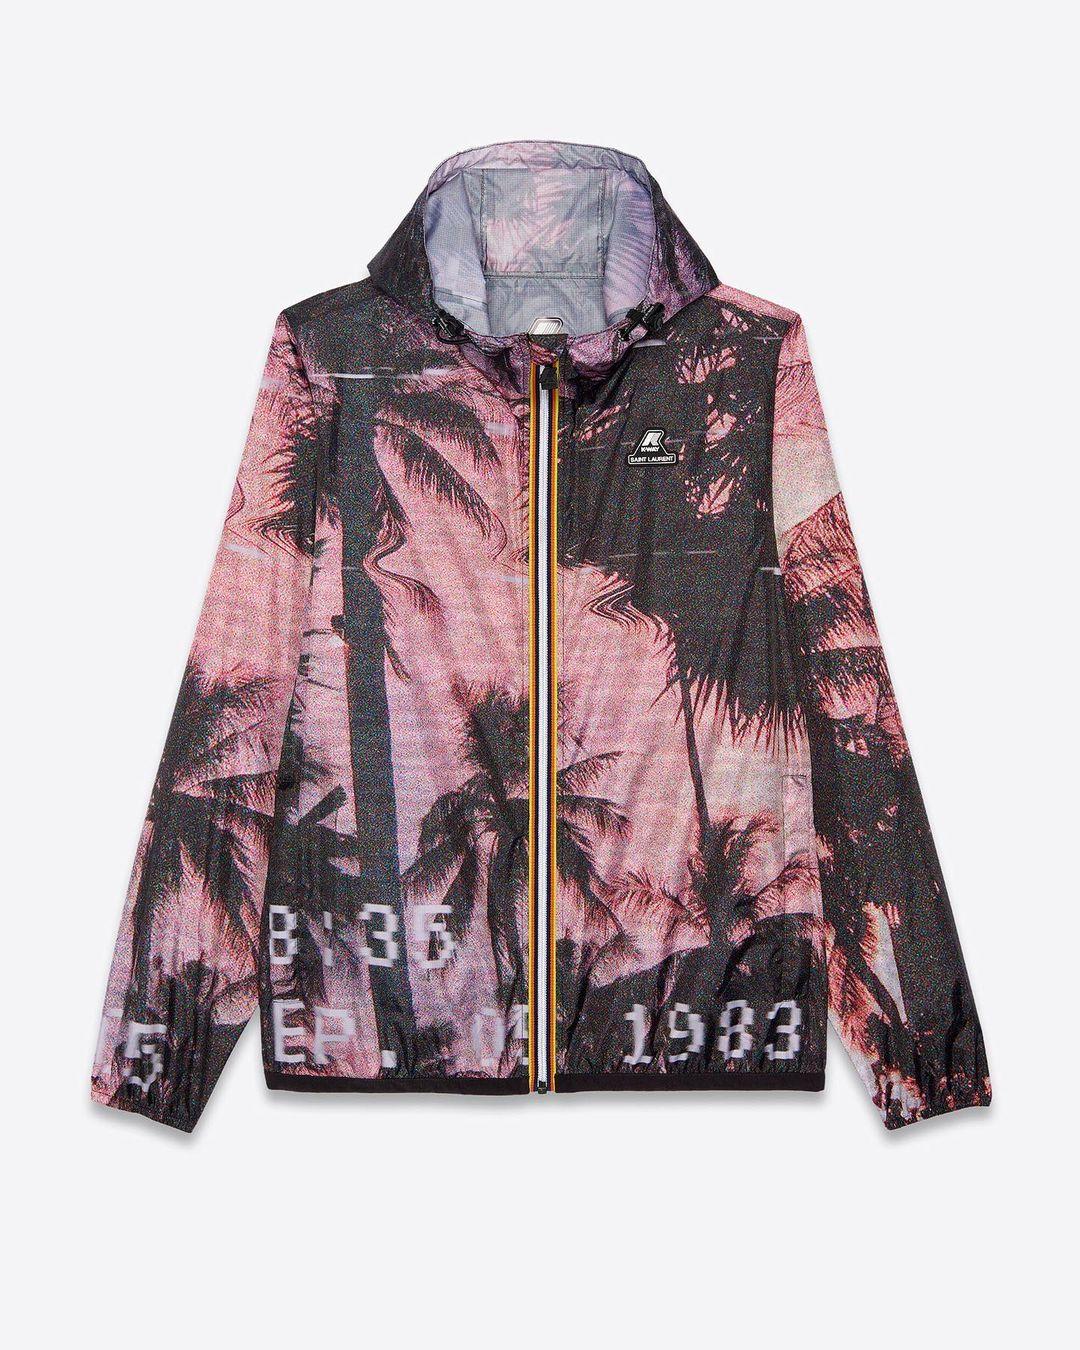 Saint Laurent X K-Way, nuova giacca limited edition